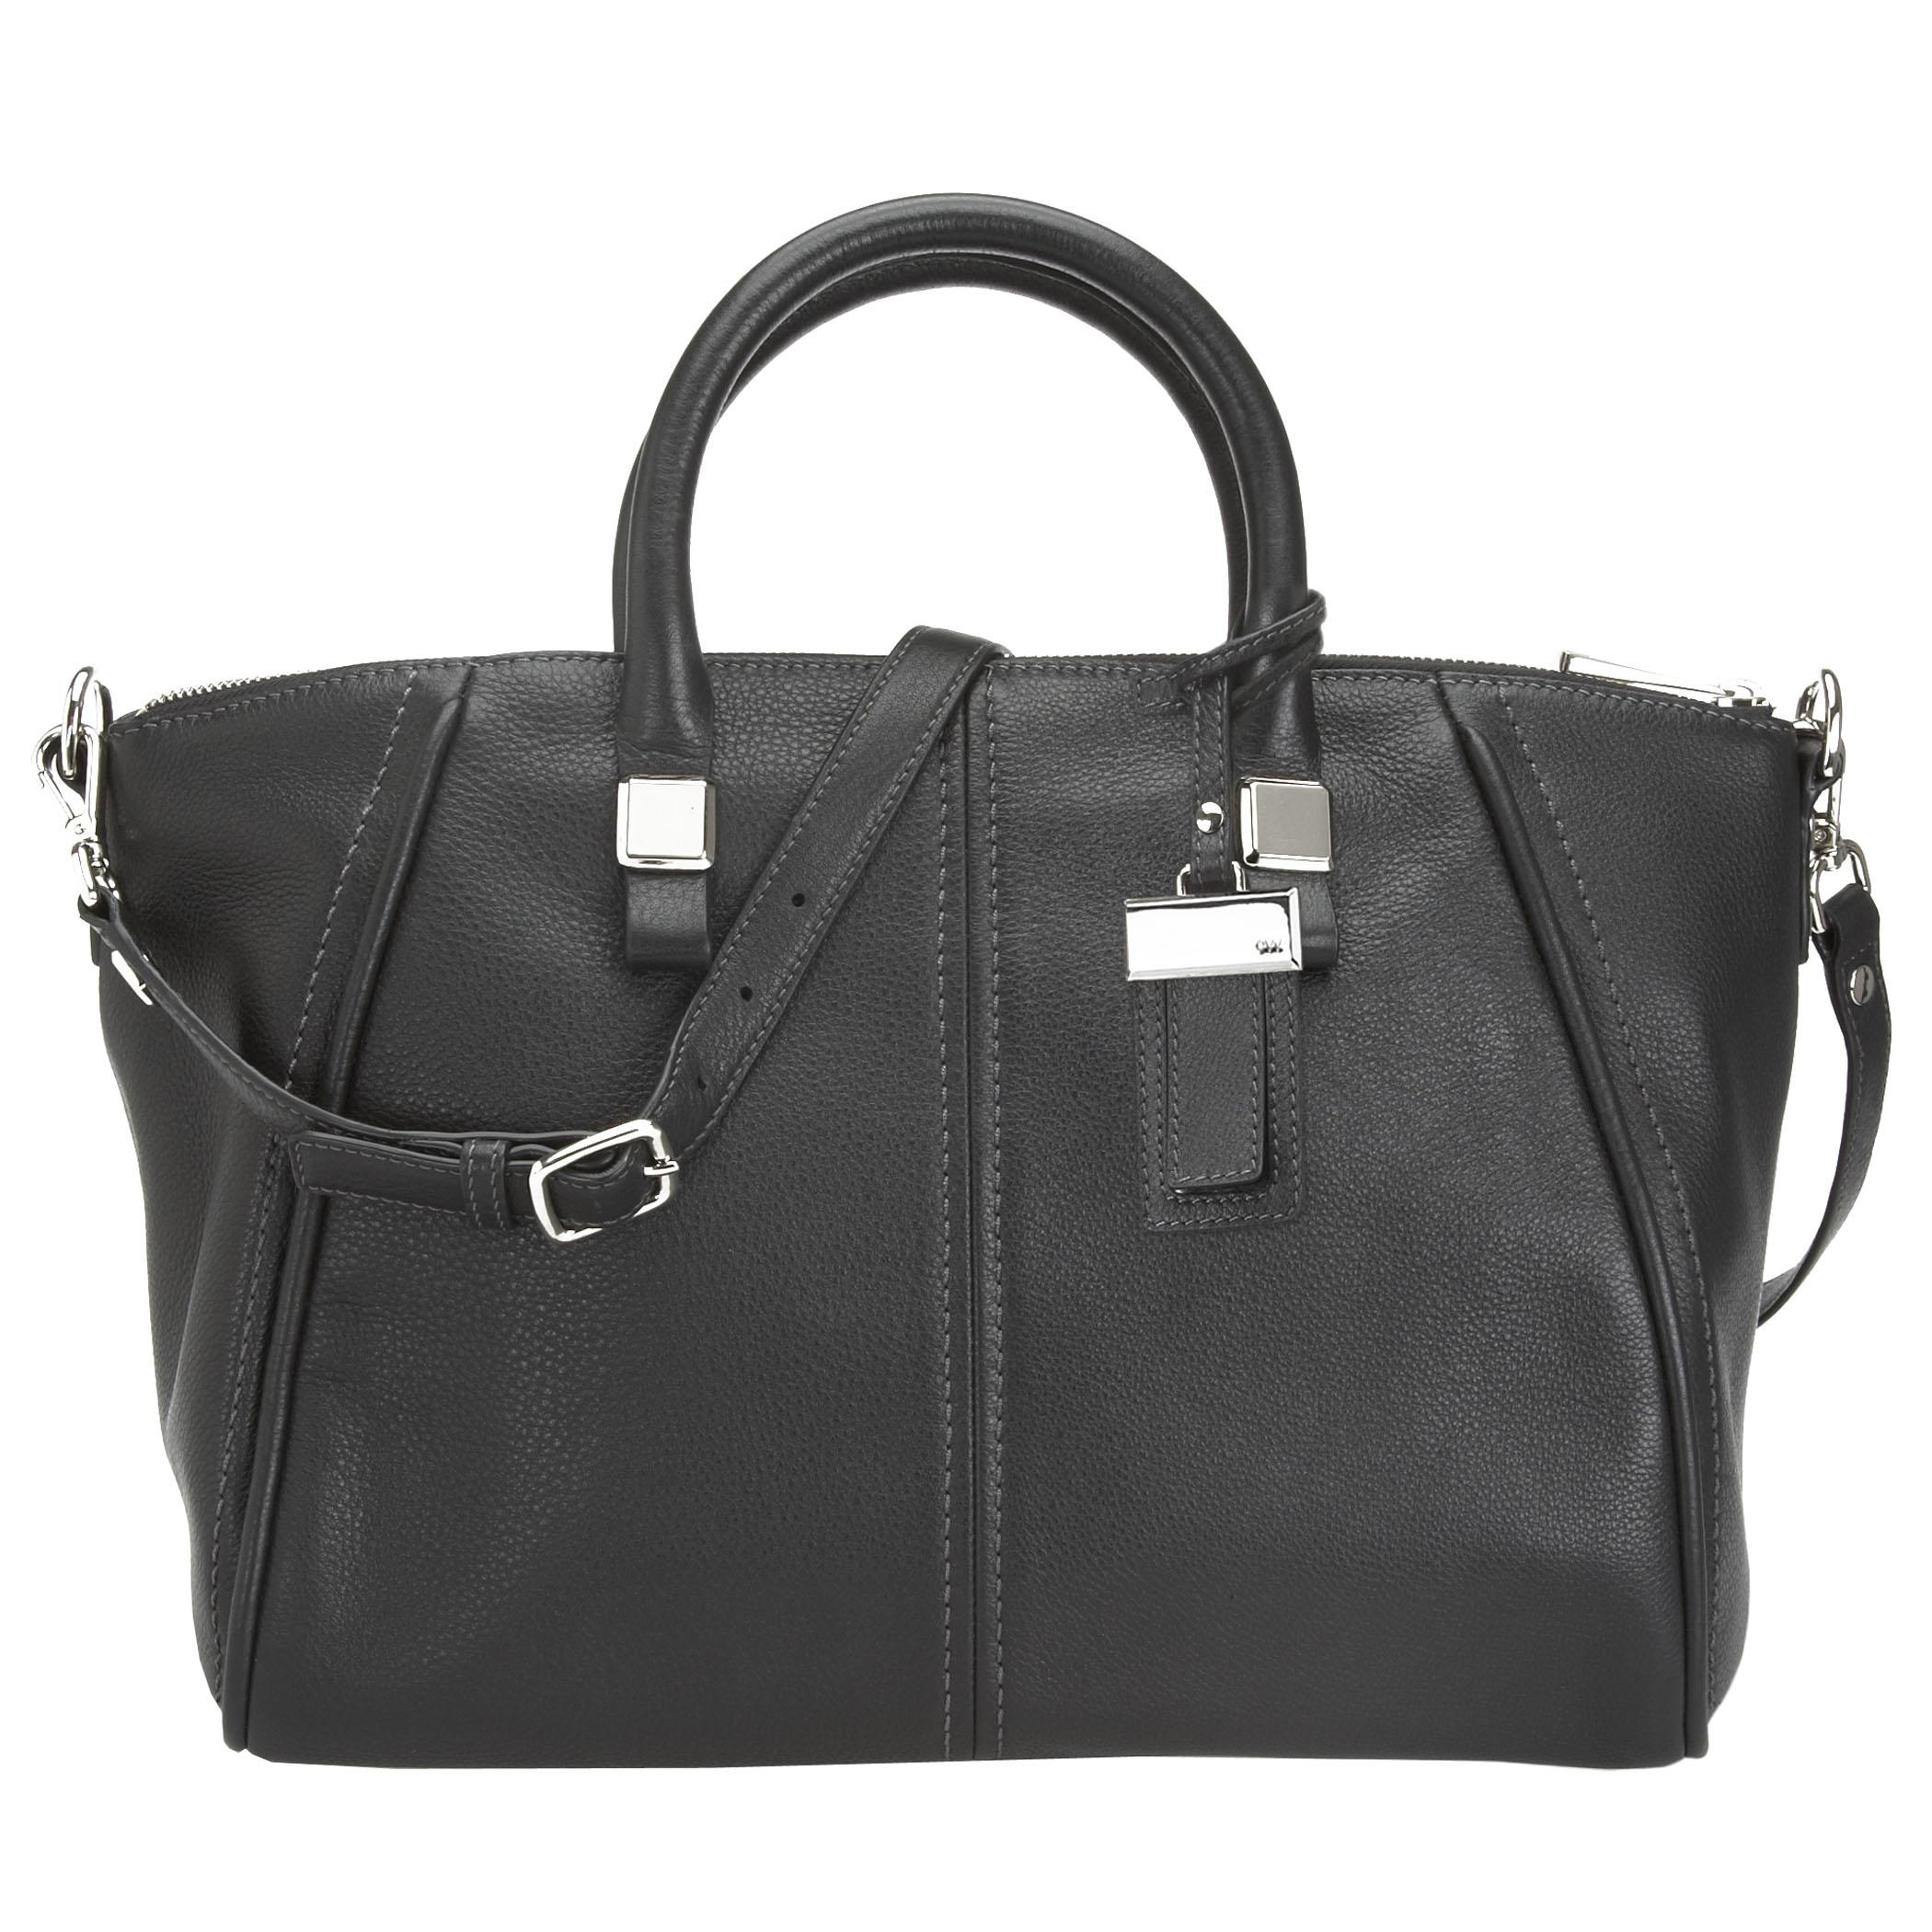 Nine West: Handbags & Accessories > Leather Handbags & Accessories > TRIBECA PEBBLED LEATHER SATCHEL BAG  - LEATHER SATCHEL BAG